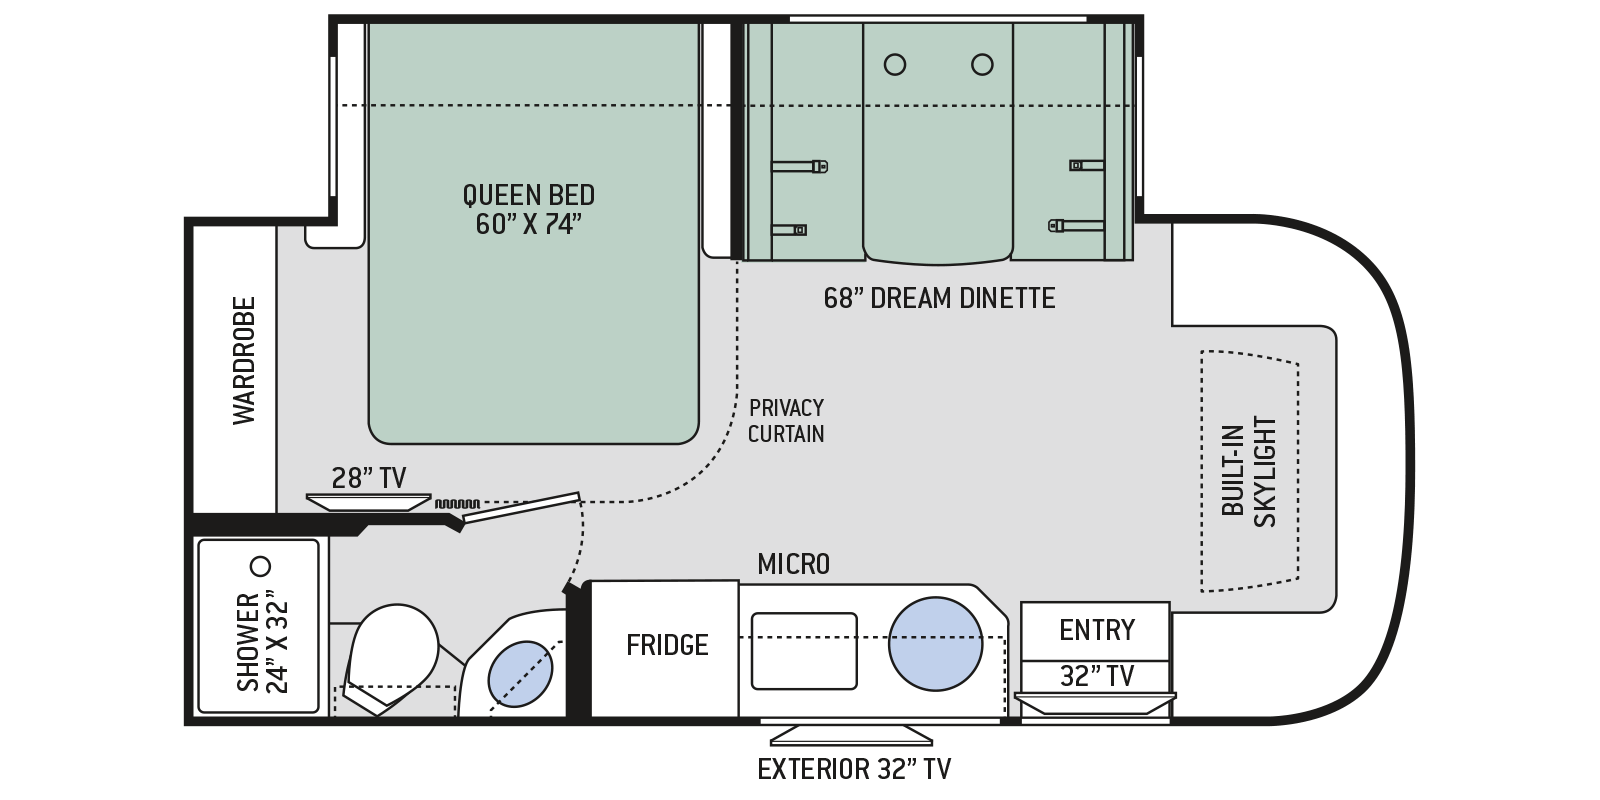 Compass Ruv Class C Motorhomes Floor Plan 23tw Thor